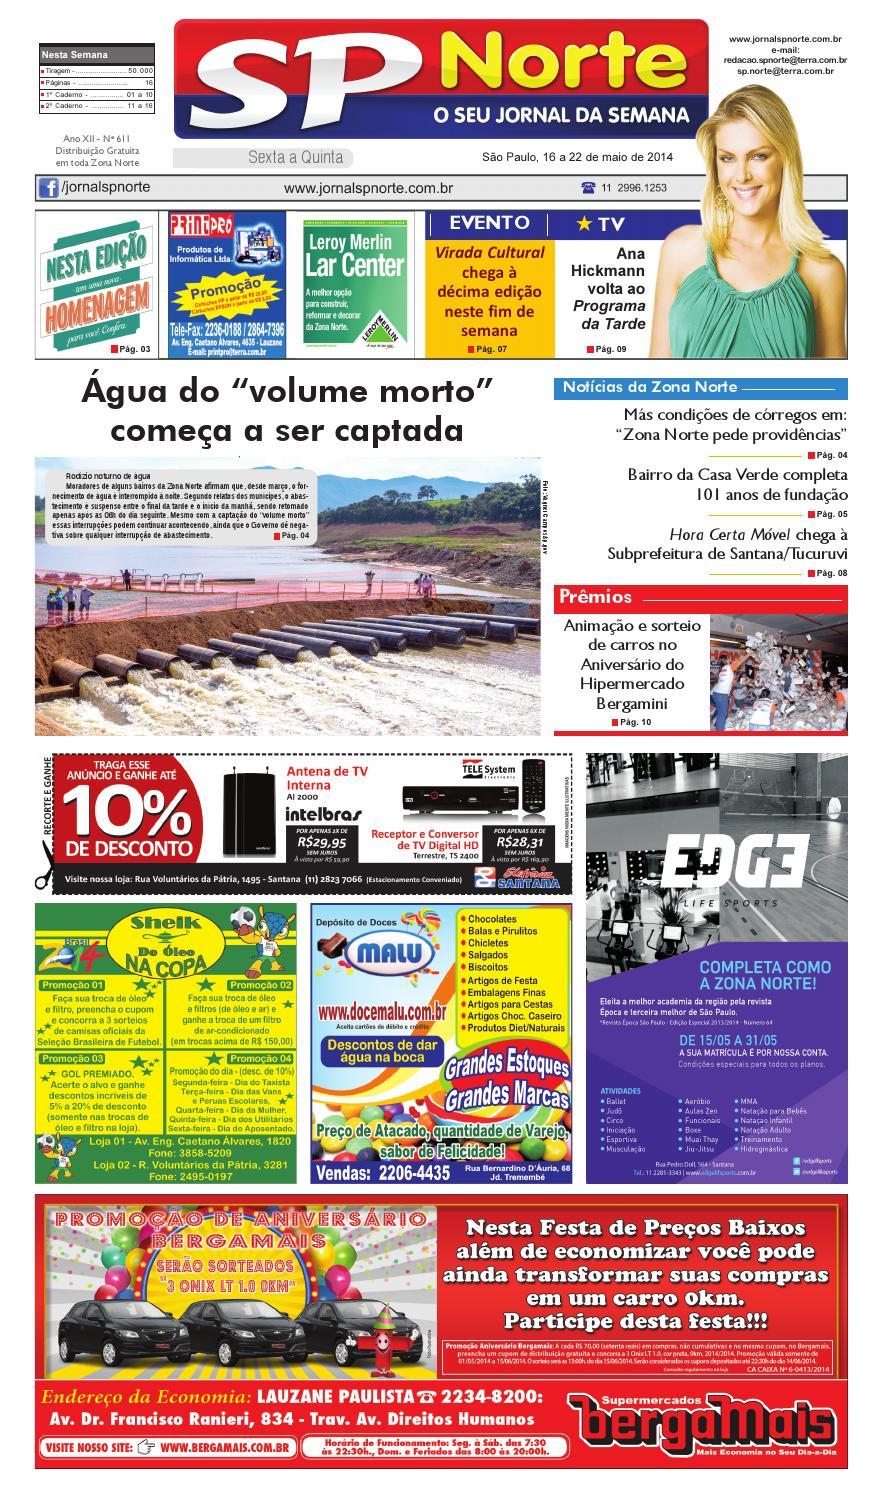 Jornal SP Norte 611 by Grupo SP de jornais - issuu b8c1aacb5f